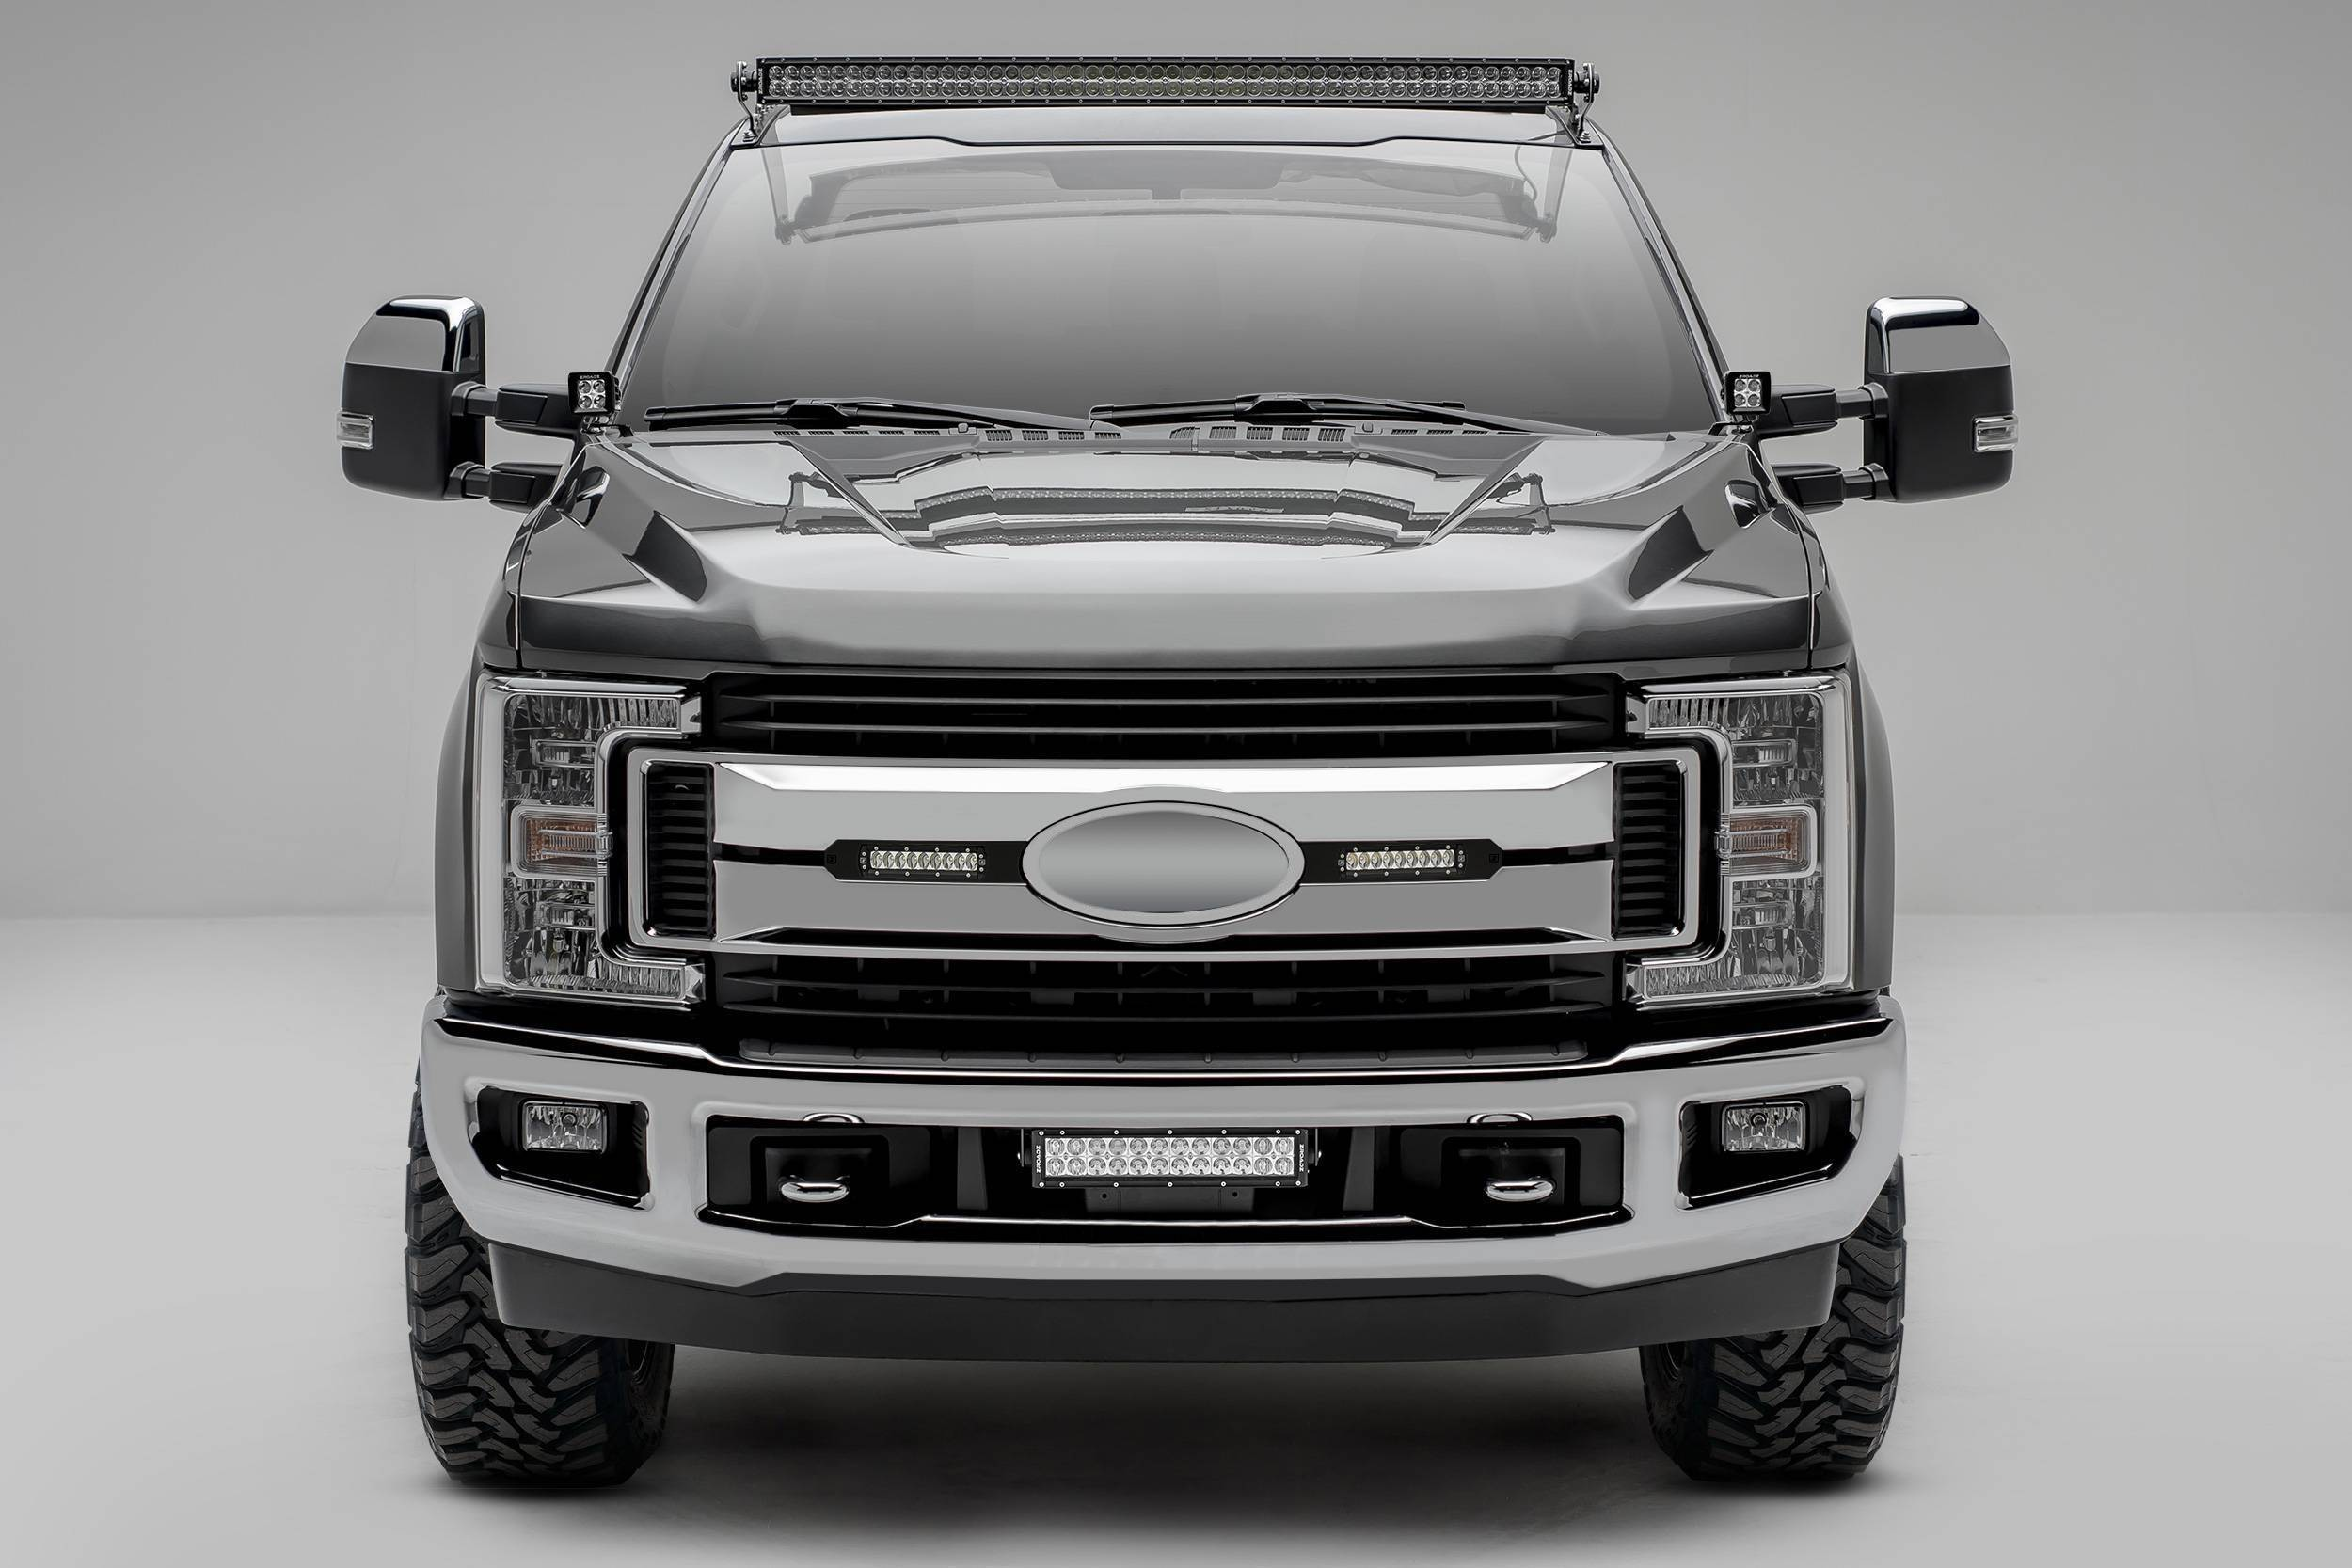 ZROADZ                                             - 2017-2019 Ford Super Duty XLT, XL STX OEM Grille LED Kit with (2) 6 Inch LED Straight Single Row Slim Light Bars, Black - PN #Z415571-KIT